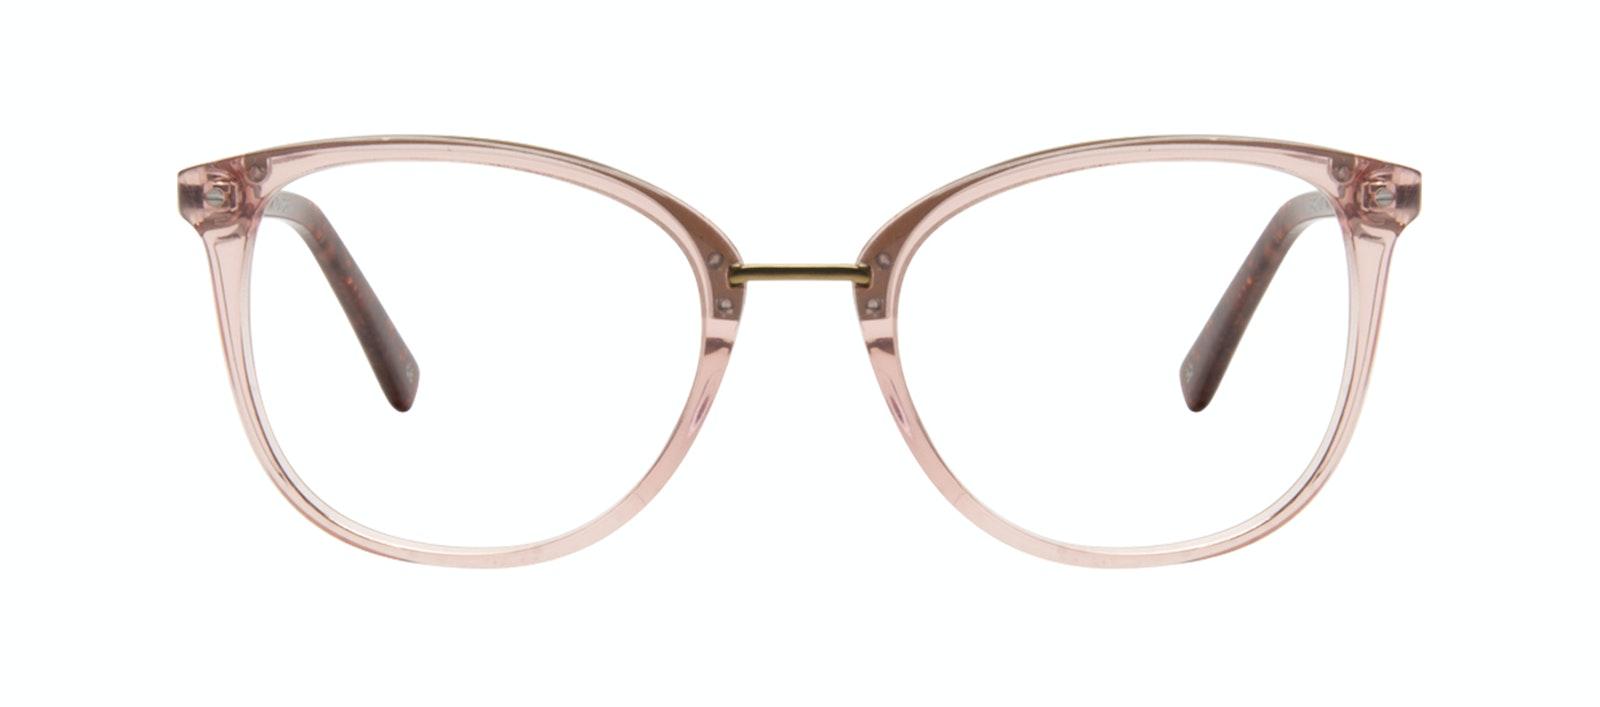 6394d10f3b51e Affordable Fashion Glasses Square Round Eyeglasses Women Bella Rose Front